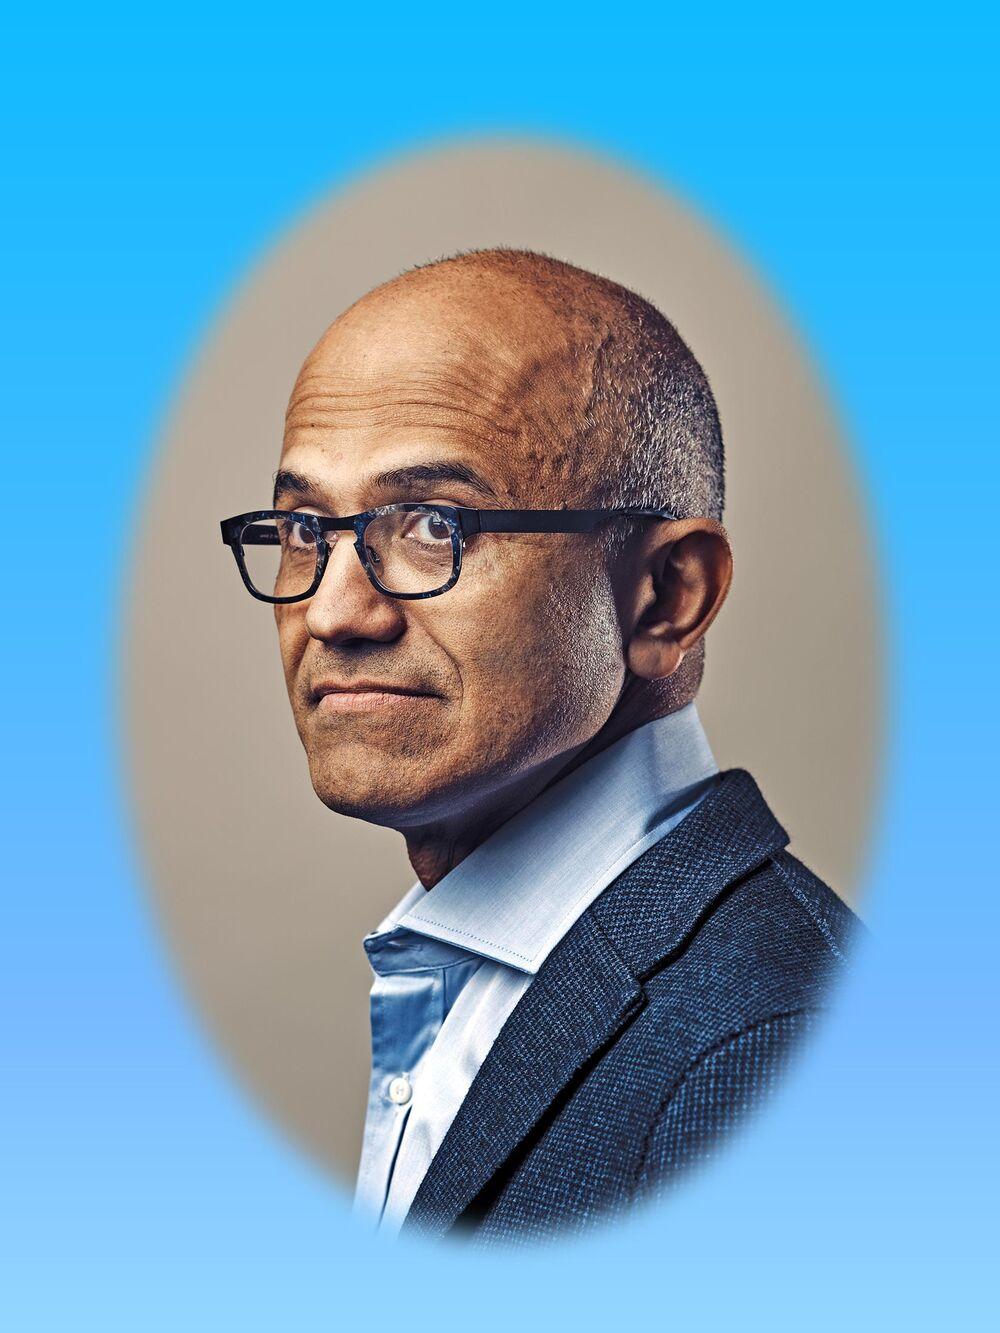 aa3b1c2958e524 Satya Nadella Remade Microsoft as World's Most Valuable Company ...